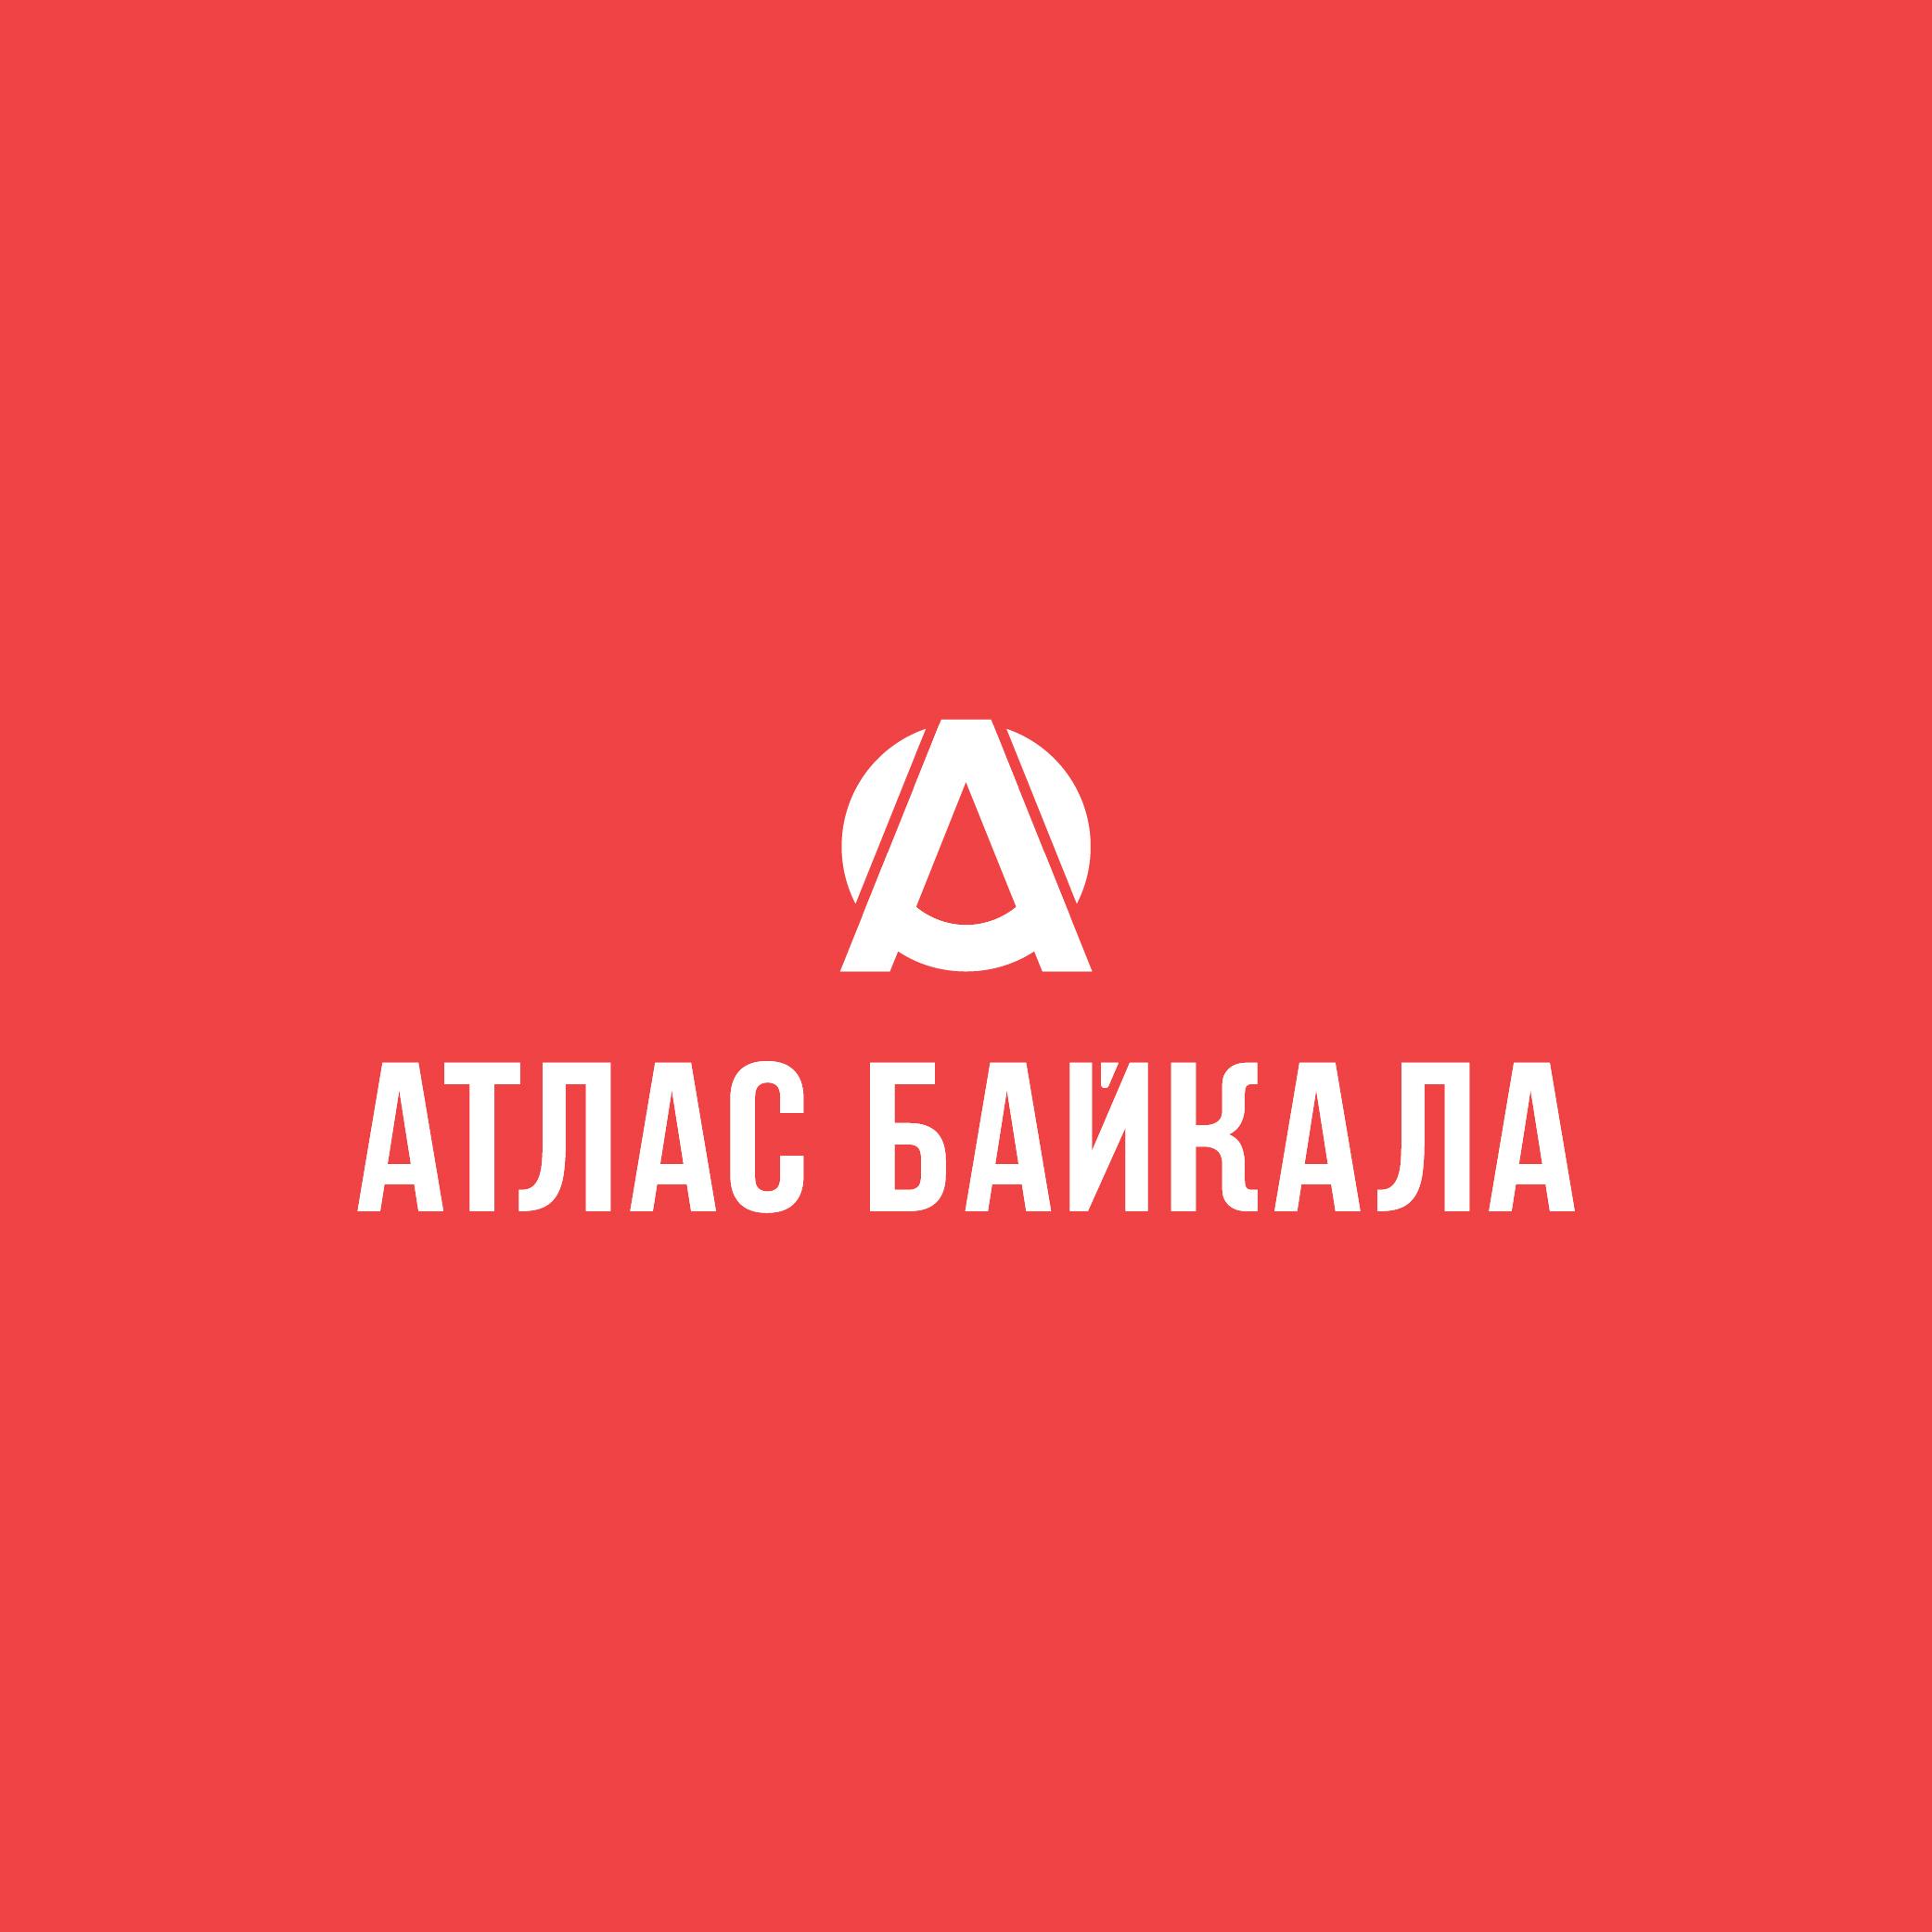 Разработка логотипа Атлас Байкала фото f_3805afc8f3ca1169.jpg